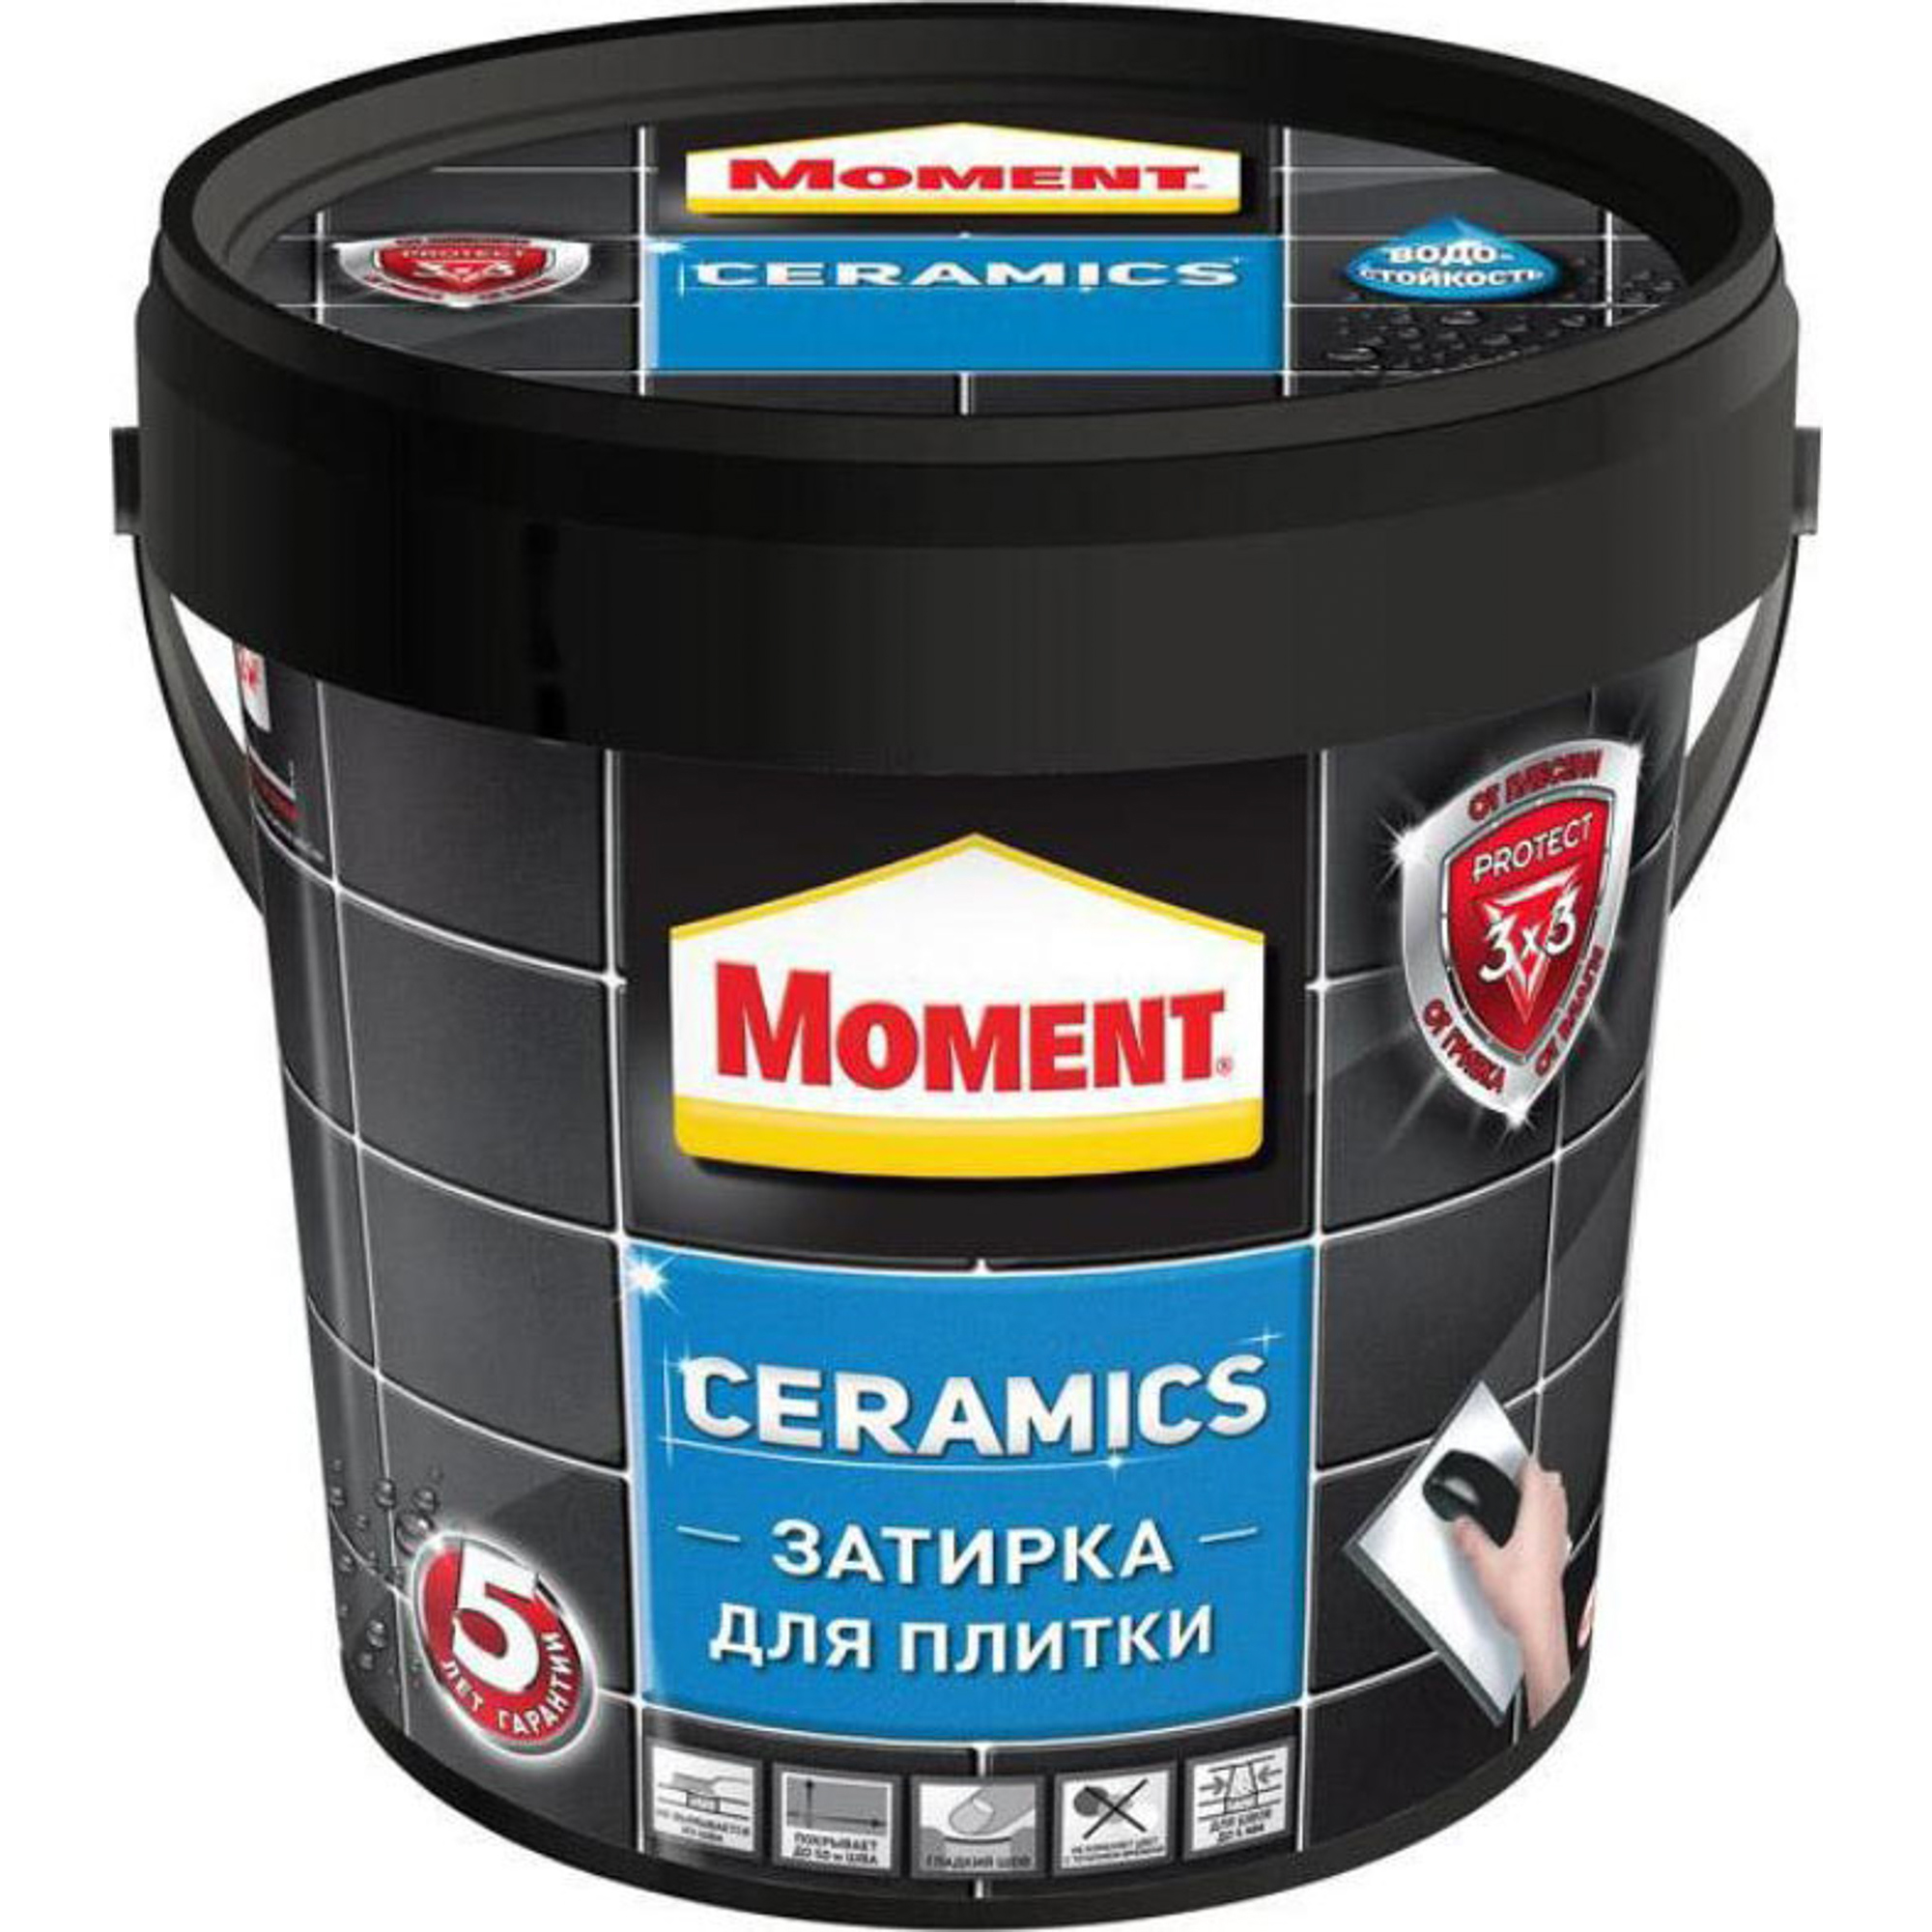 Затирка Момент Ceramics темно-коричневая 1 кг